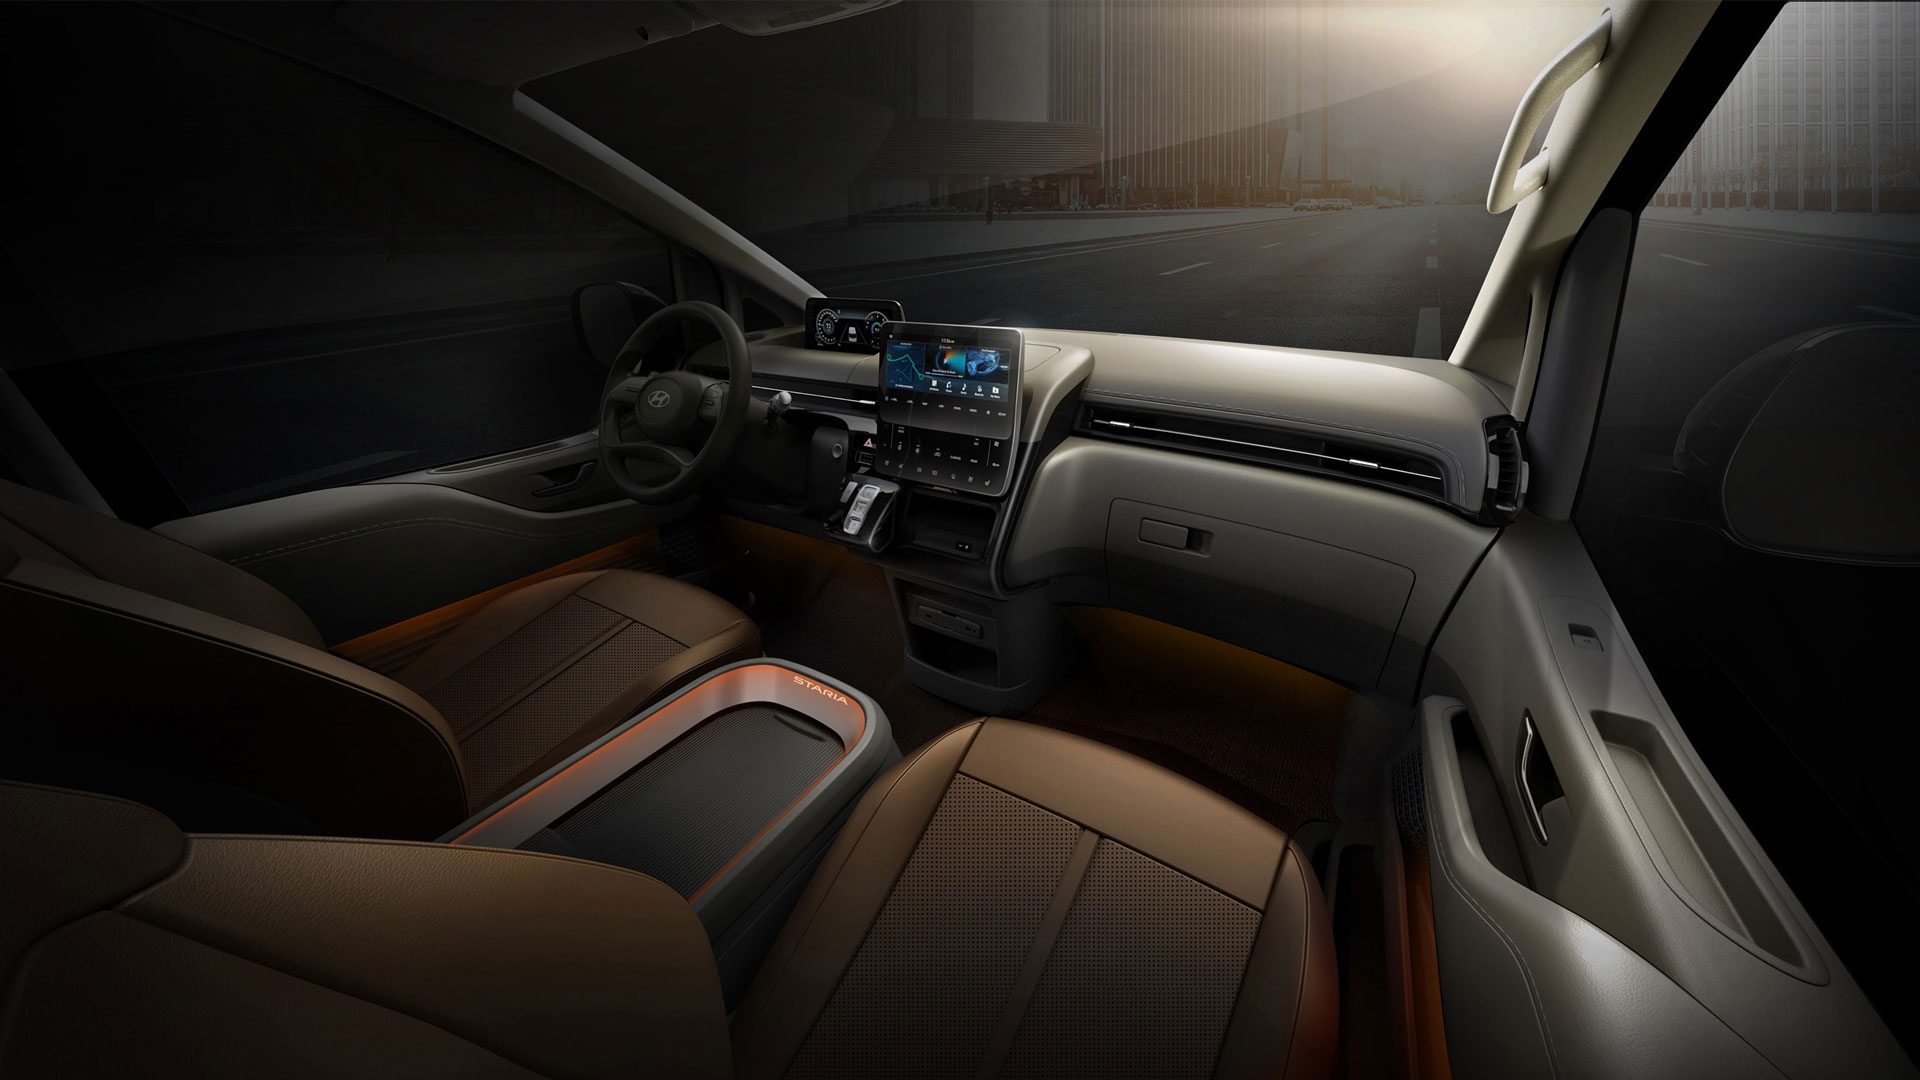 The Hyundai Staria interior